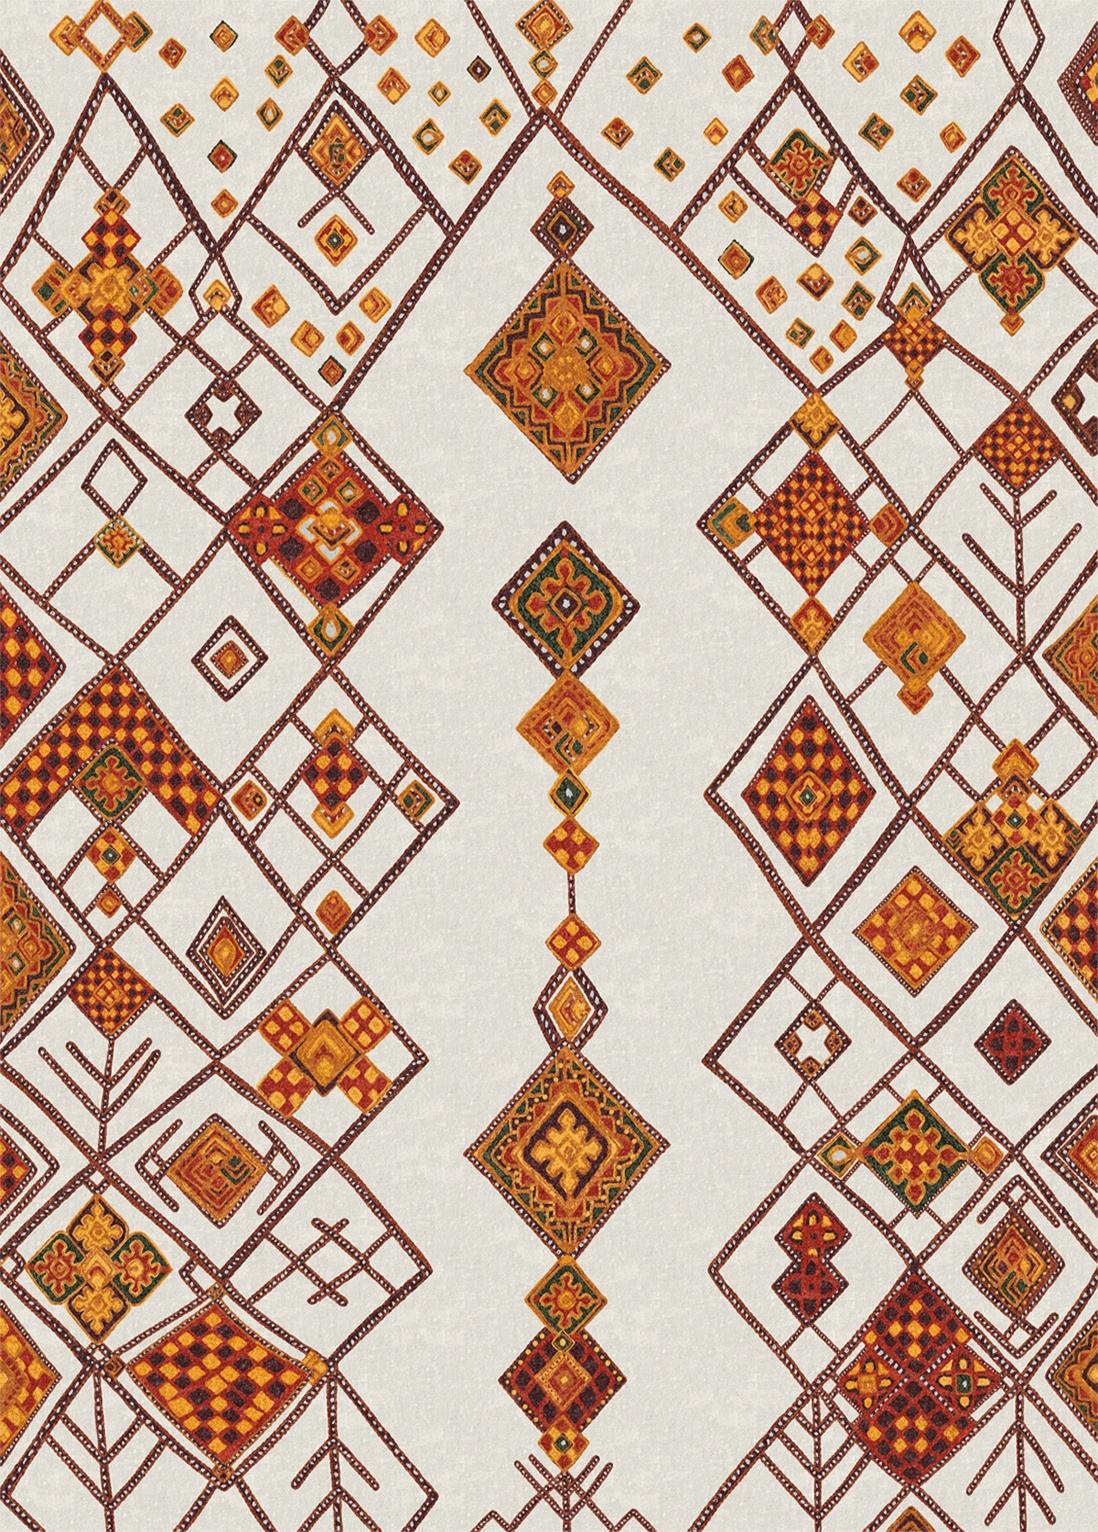 Moroccan Rug - Farah Autumn